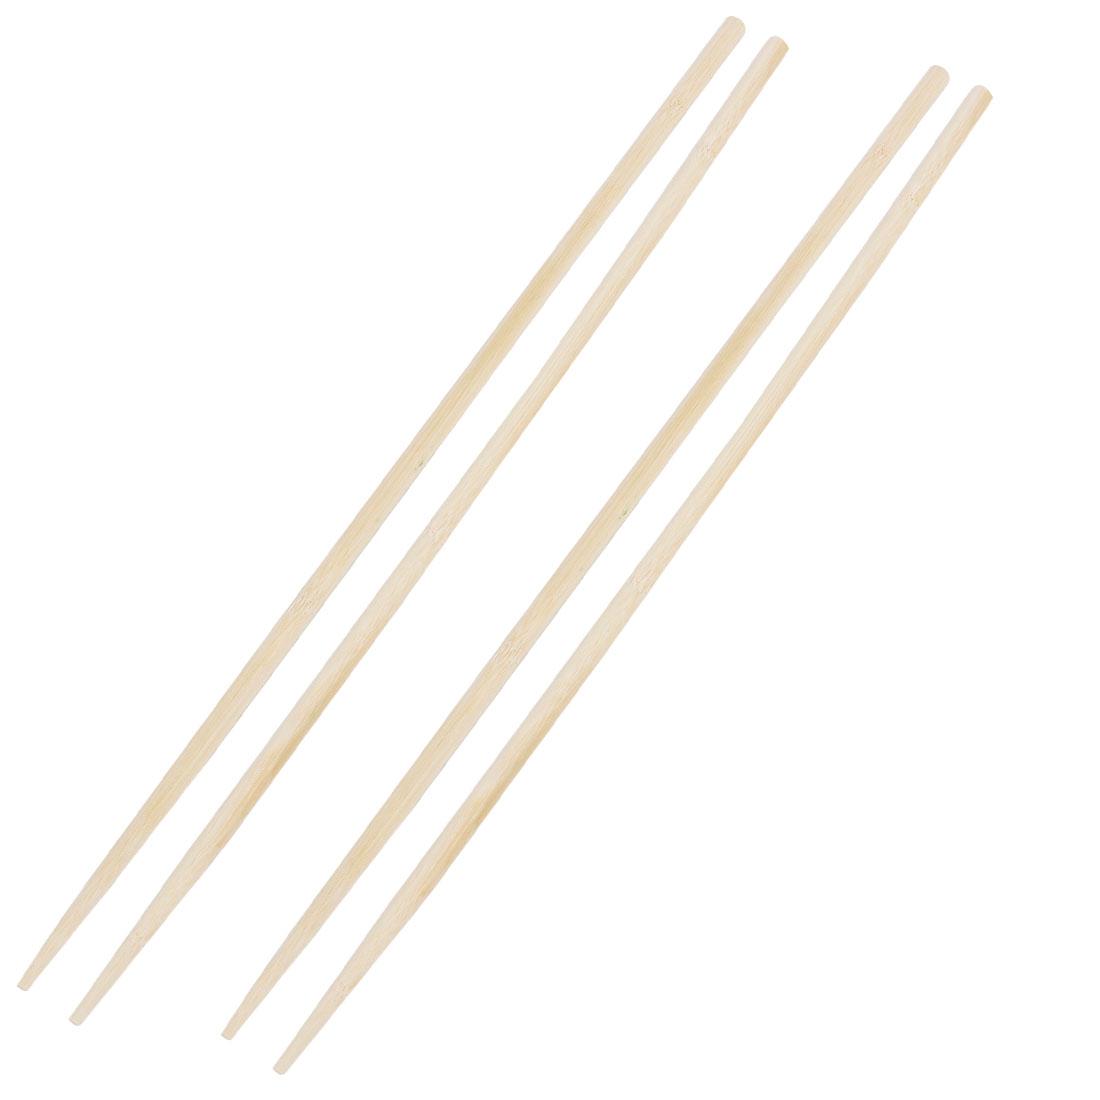 "2 Pairs Beige Wooden Noodles Cooking Chopsticks 45cm 18"" Length"